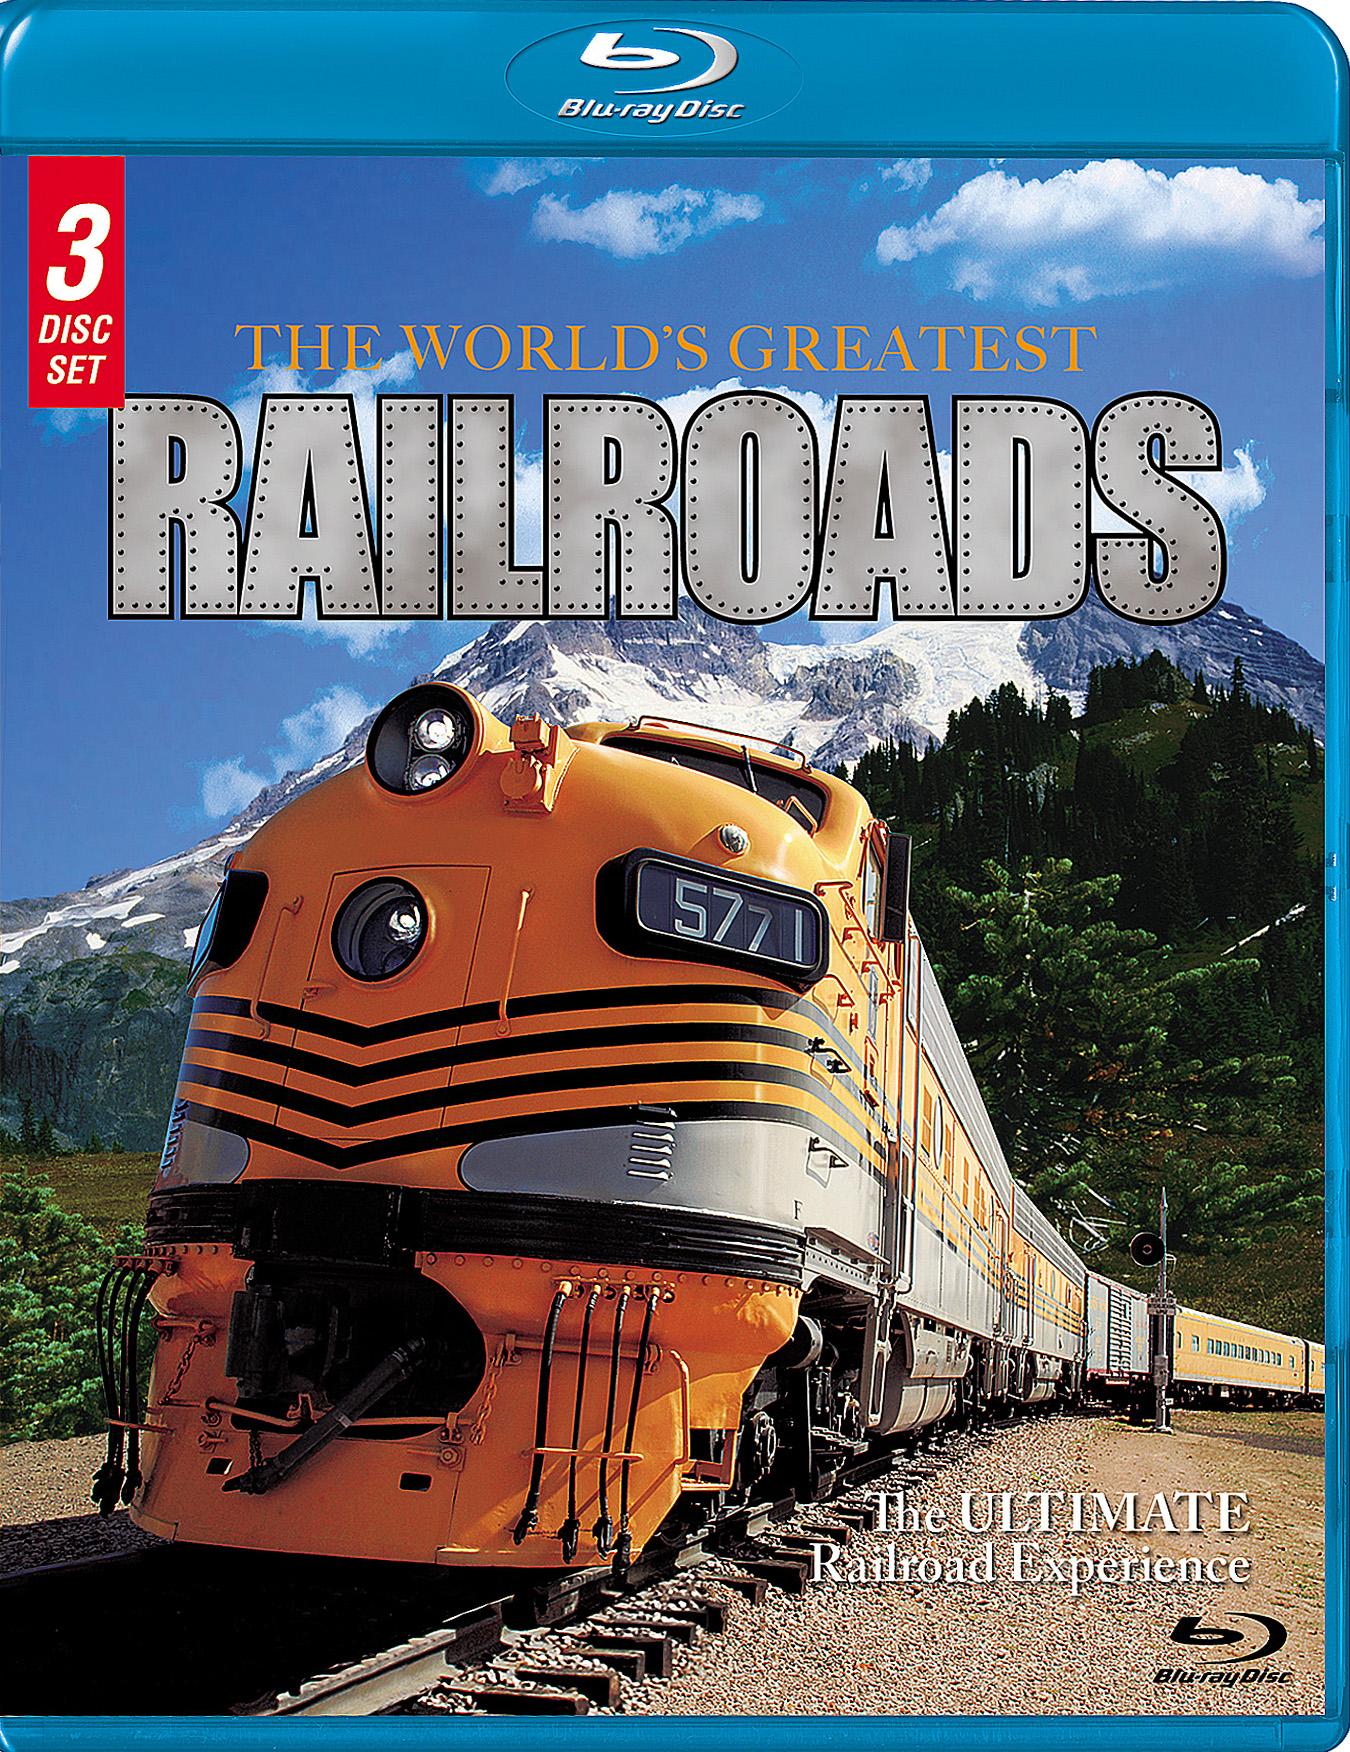 The World's Greatest Railroads [3 Discs] (blu-ray) 24652164